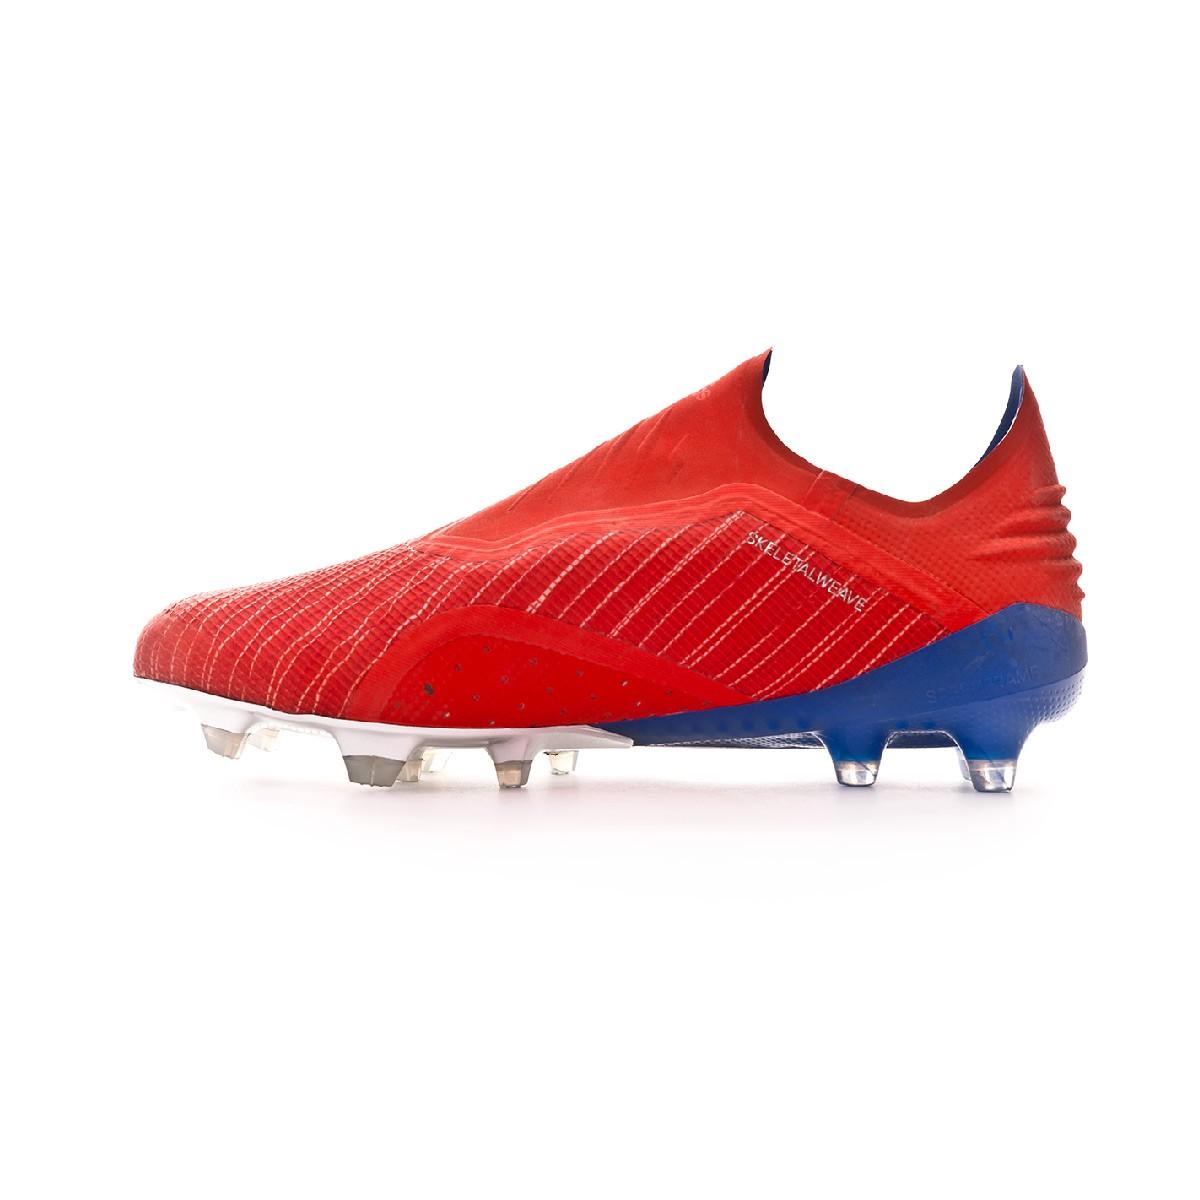 Chaussure de foot adidas X 18+ FG